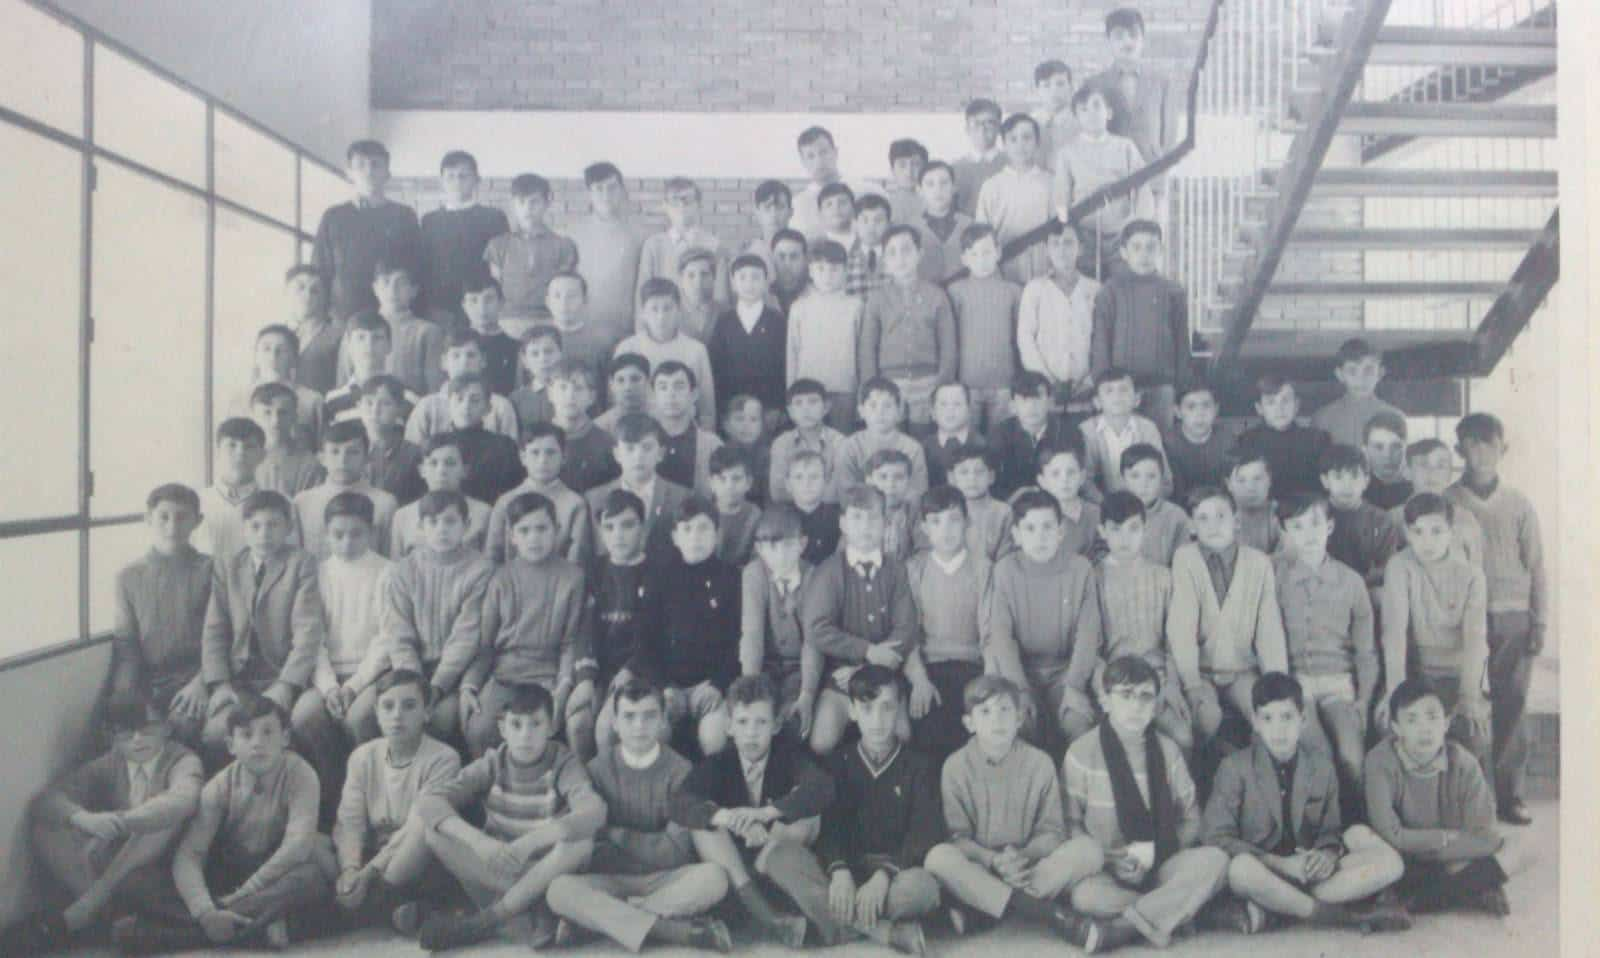 antiguos alumnos seminario menor mercedario - Encuentro de antiguos alumnos del colegio seminario menor mercedario